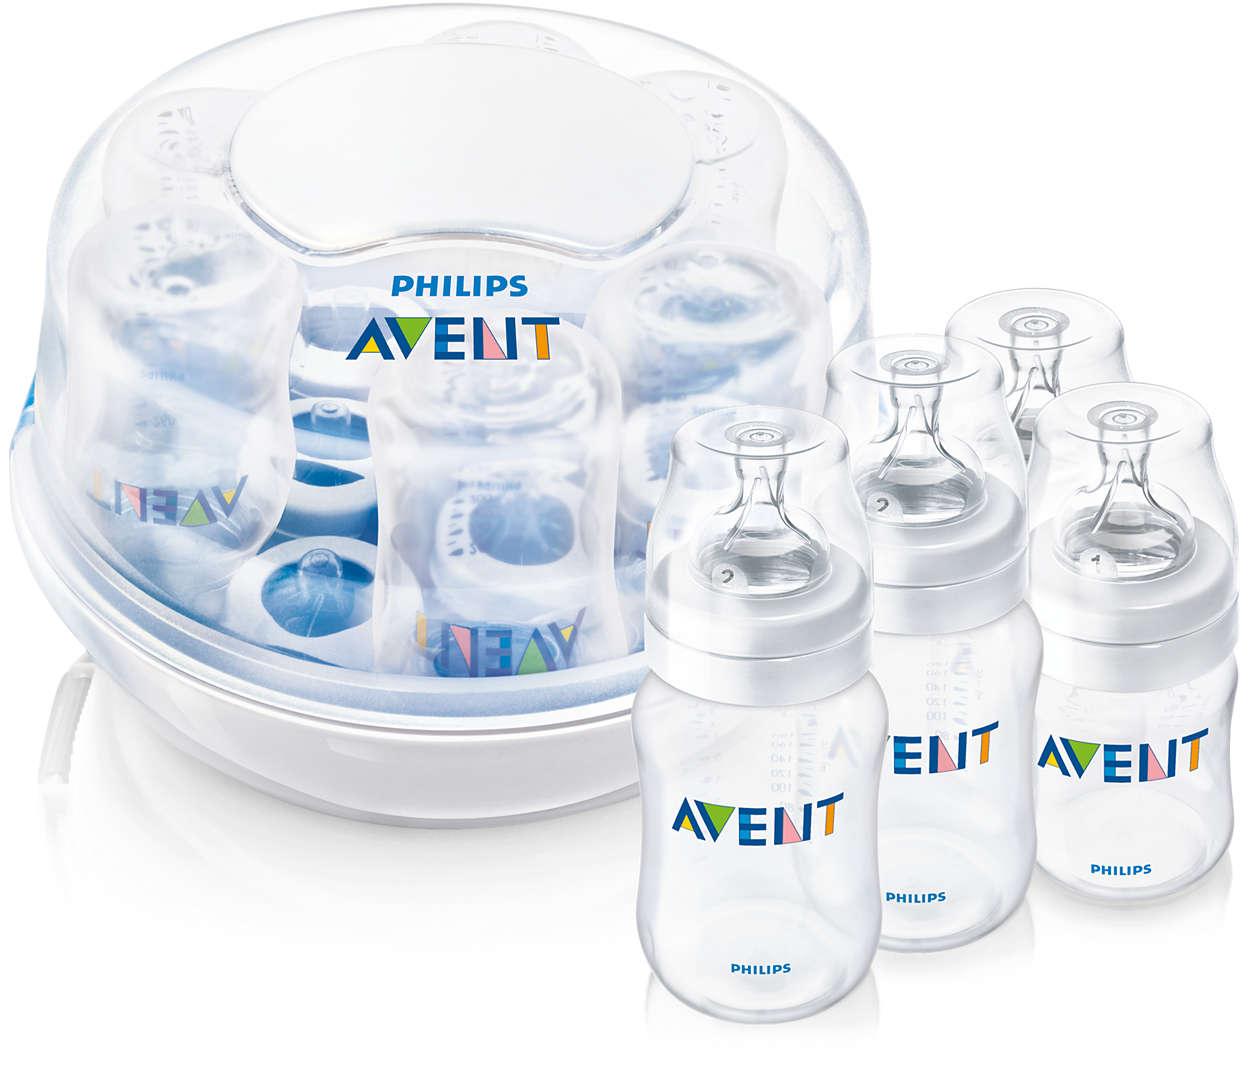 Steriliserer 6 flasker på 2 minutter*